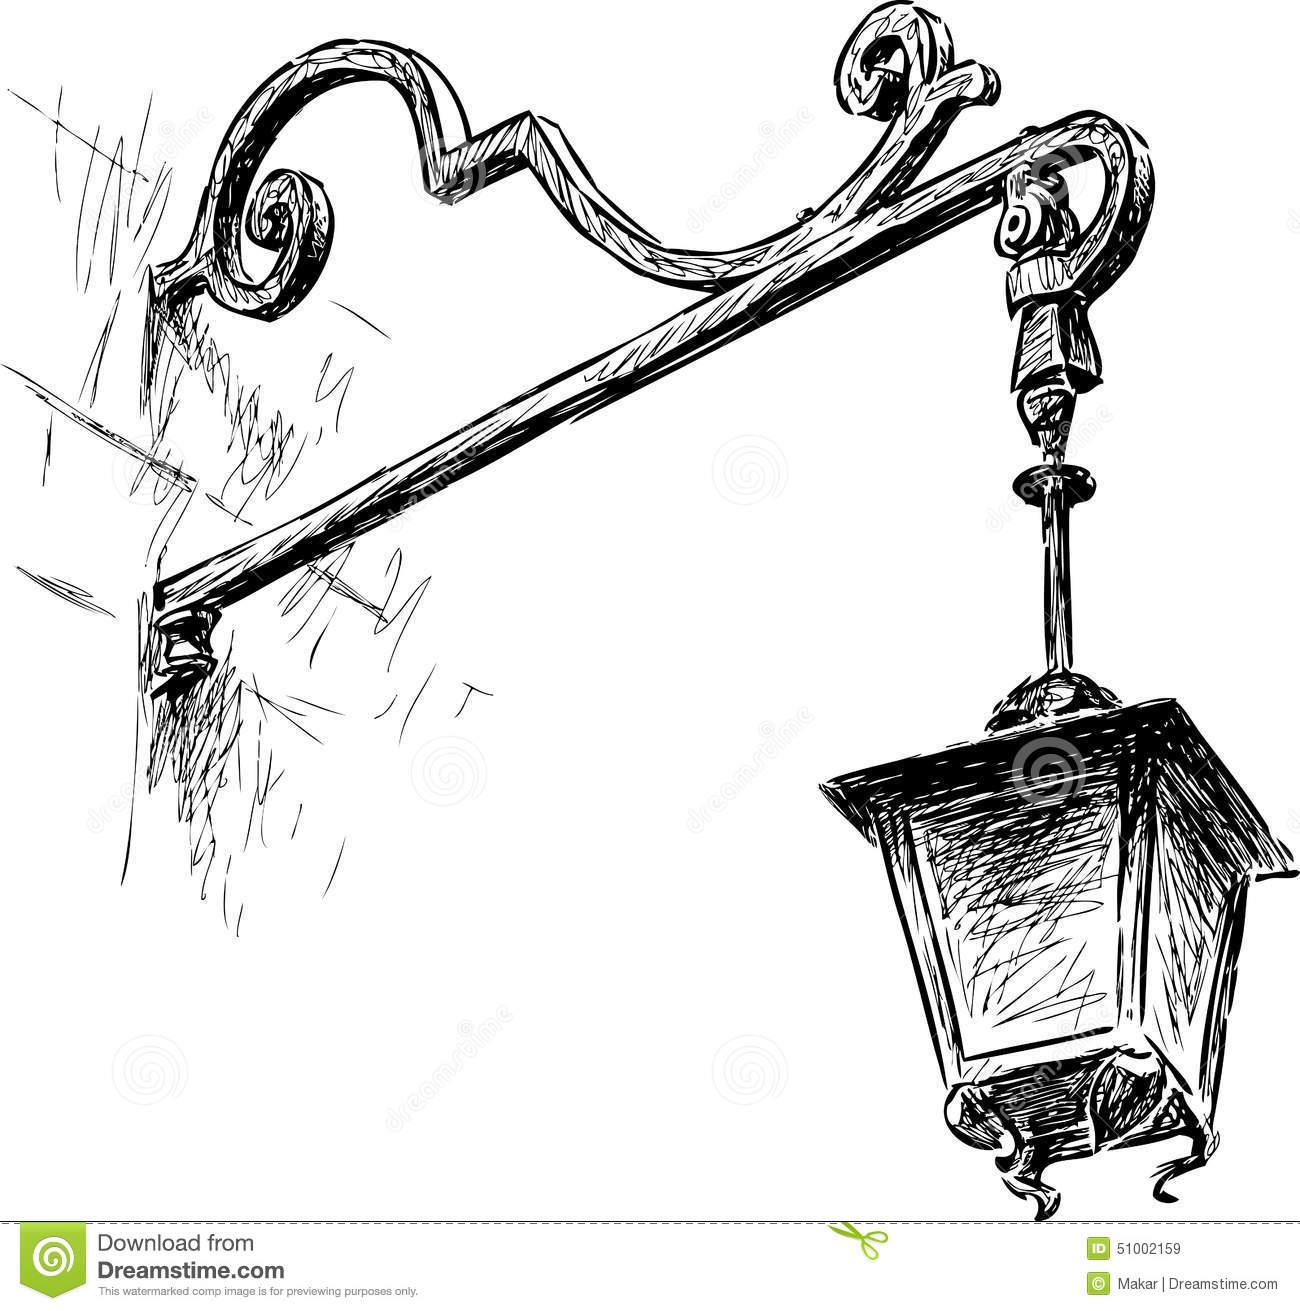 Drawn lamp Draw Google lamp lamp street